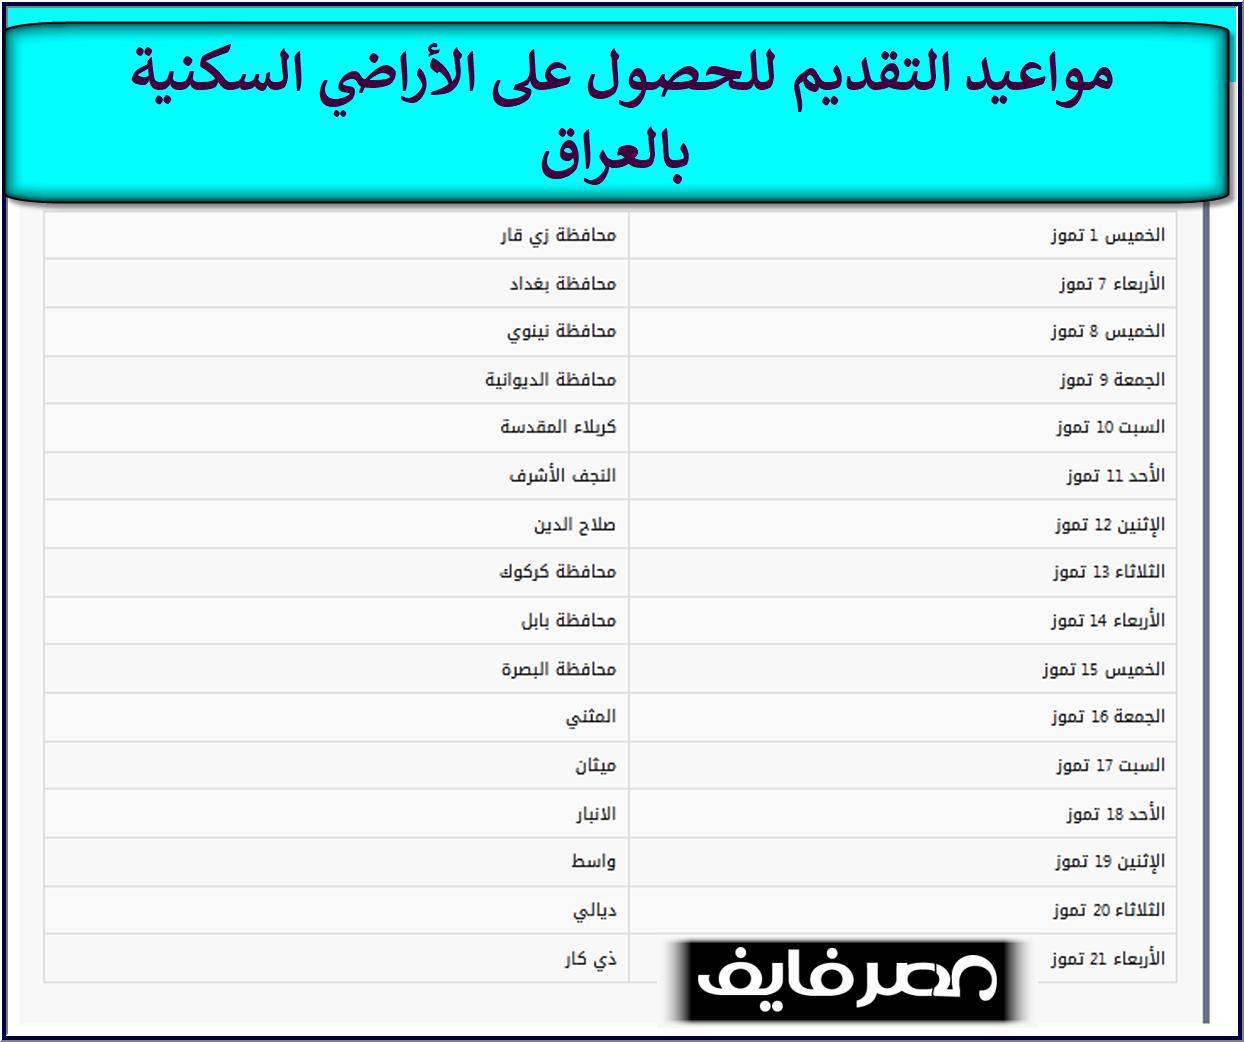 dari iq رابط الاستمارة الالكترونية لتوزيع الاراضي للمواطنين